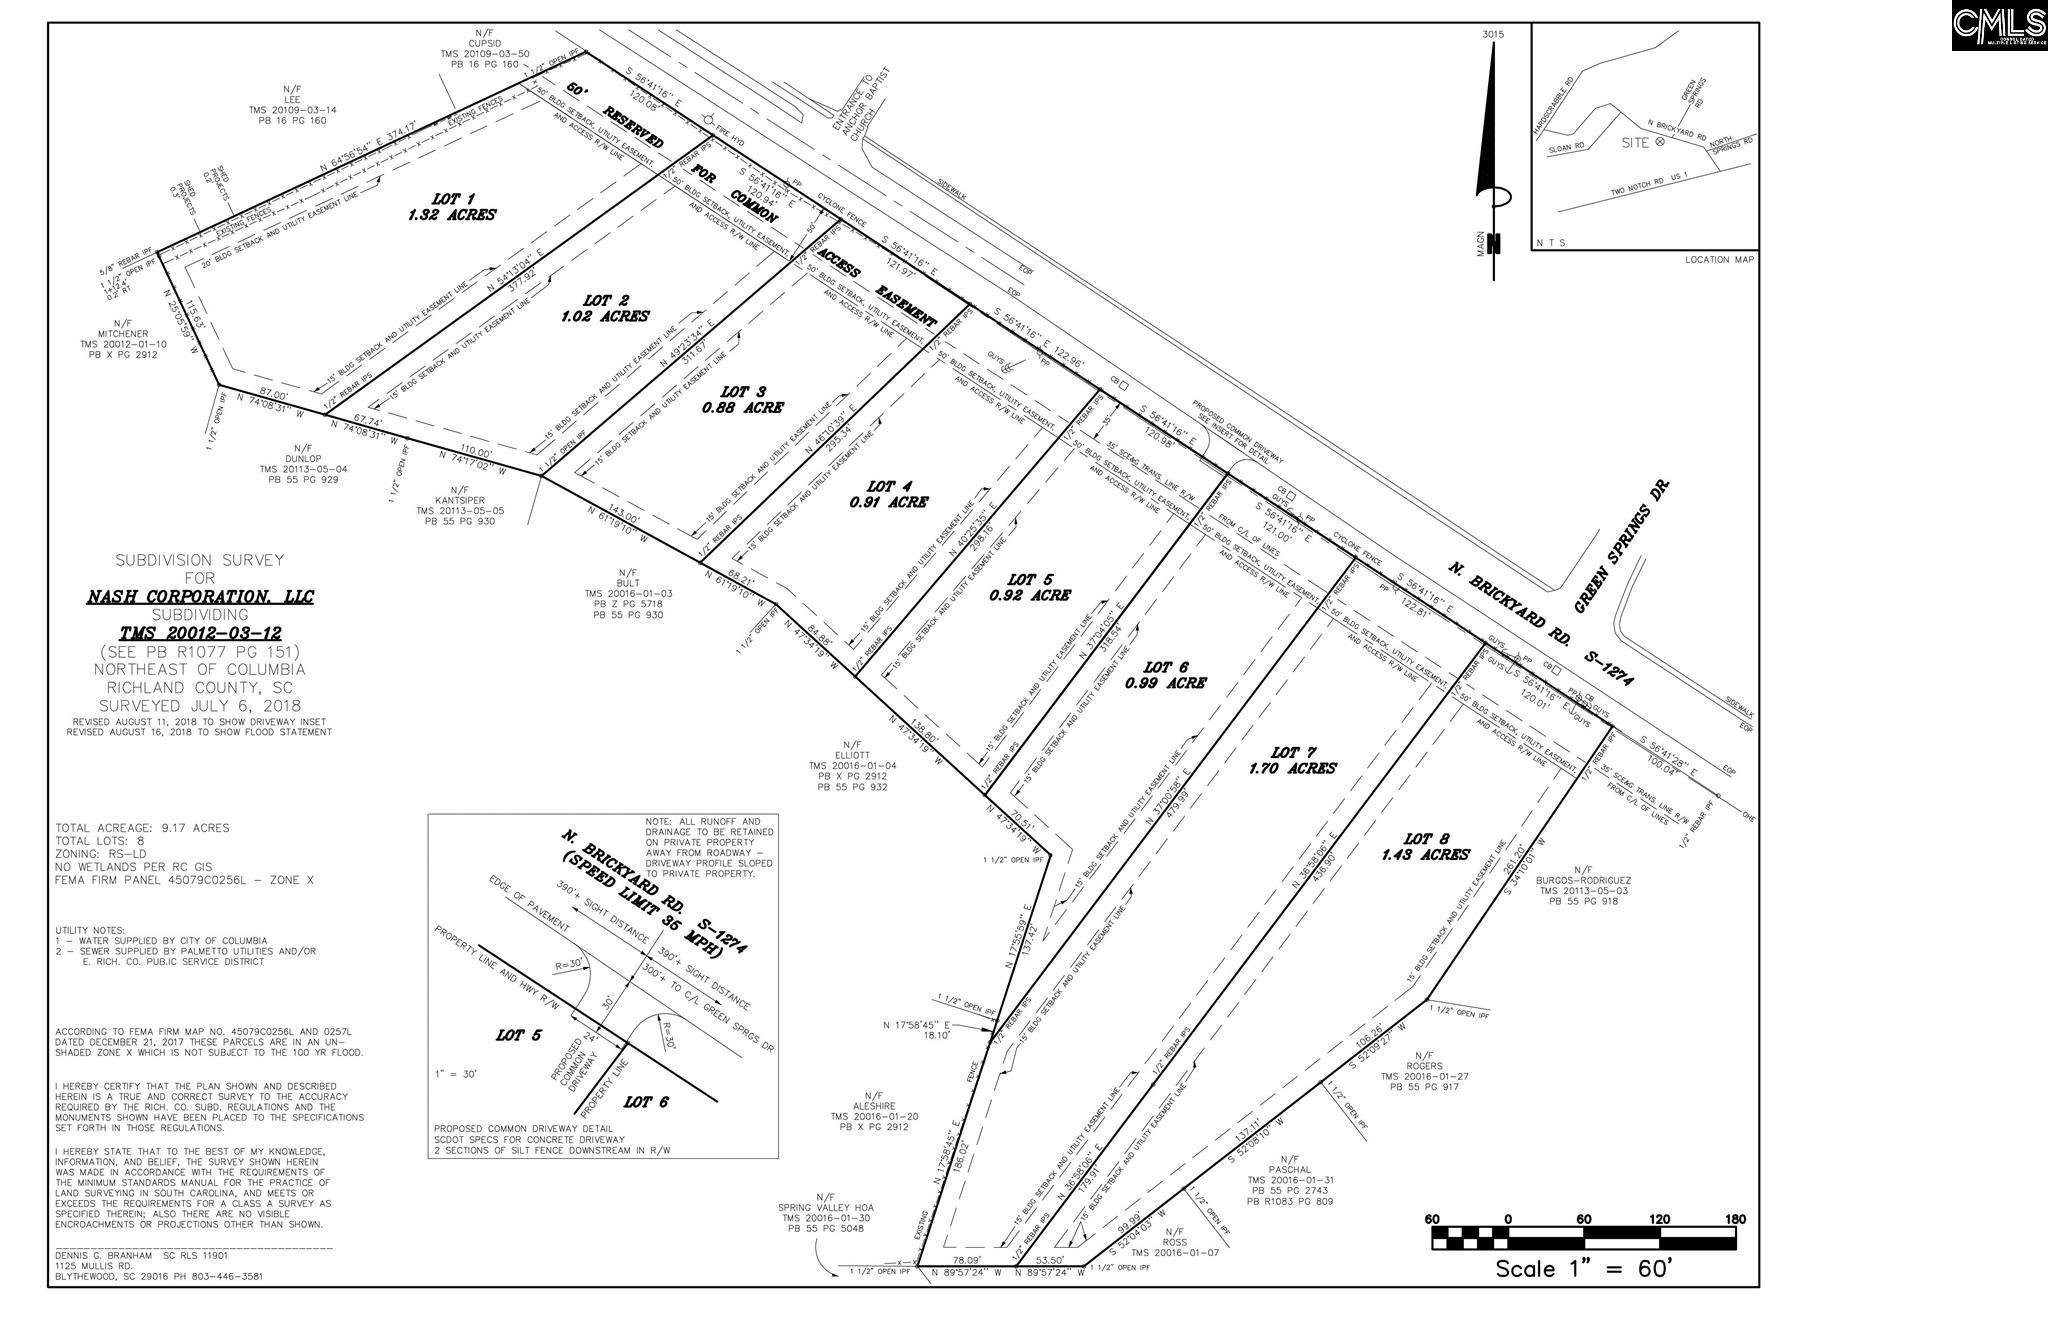 339 N Brickyard Rd. Columbia, SC 29223